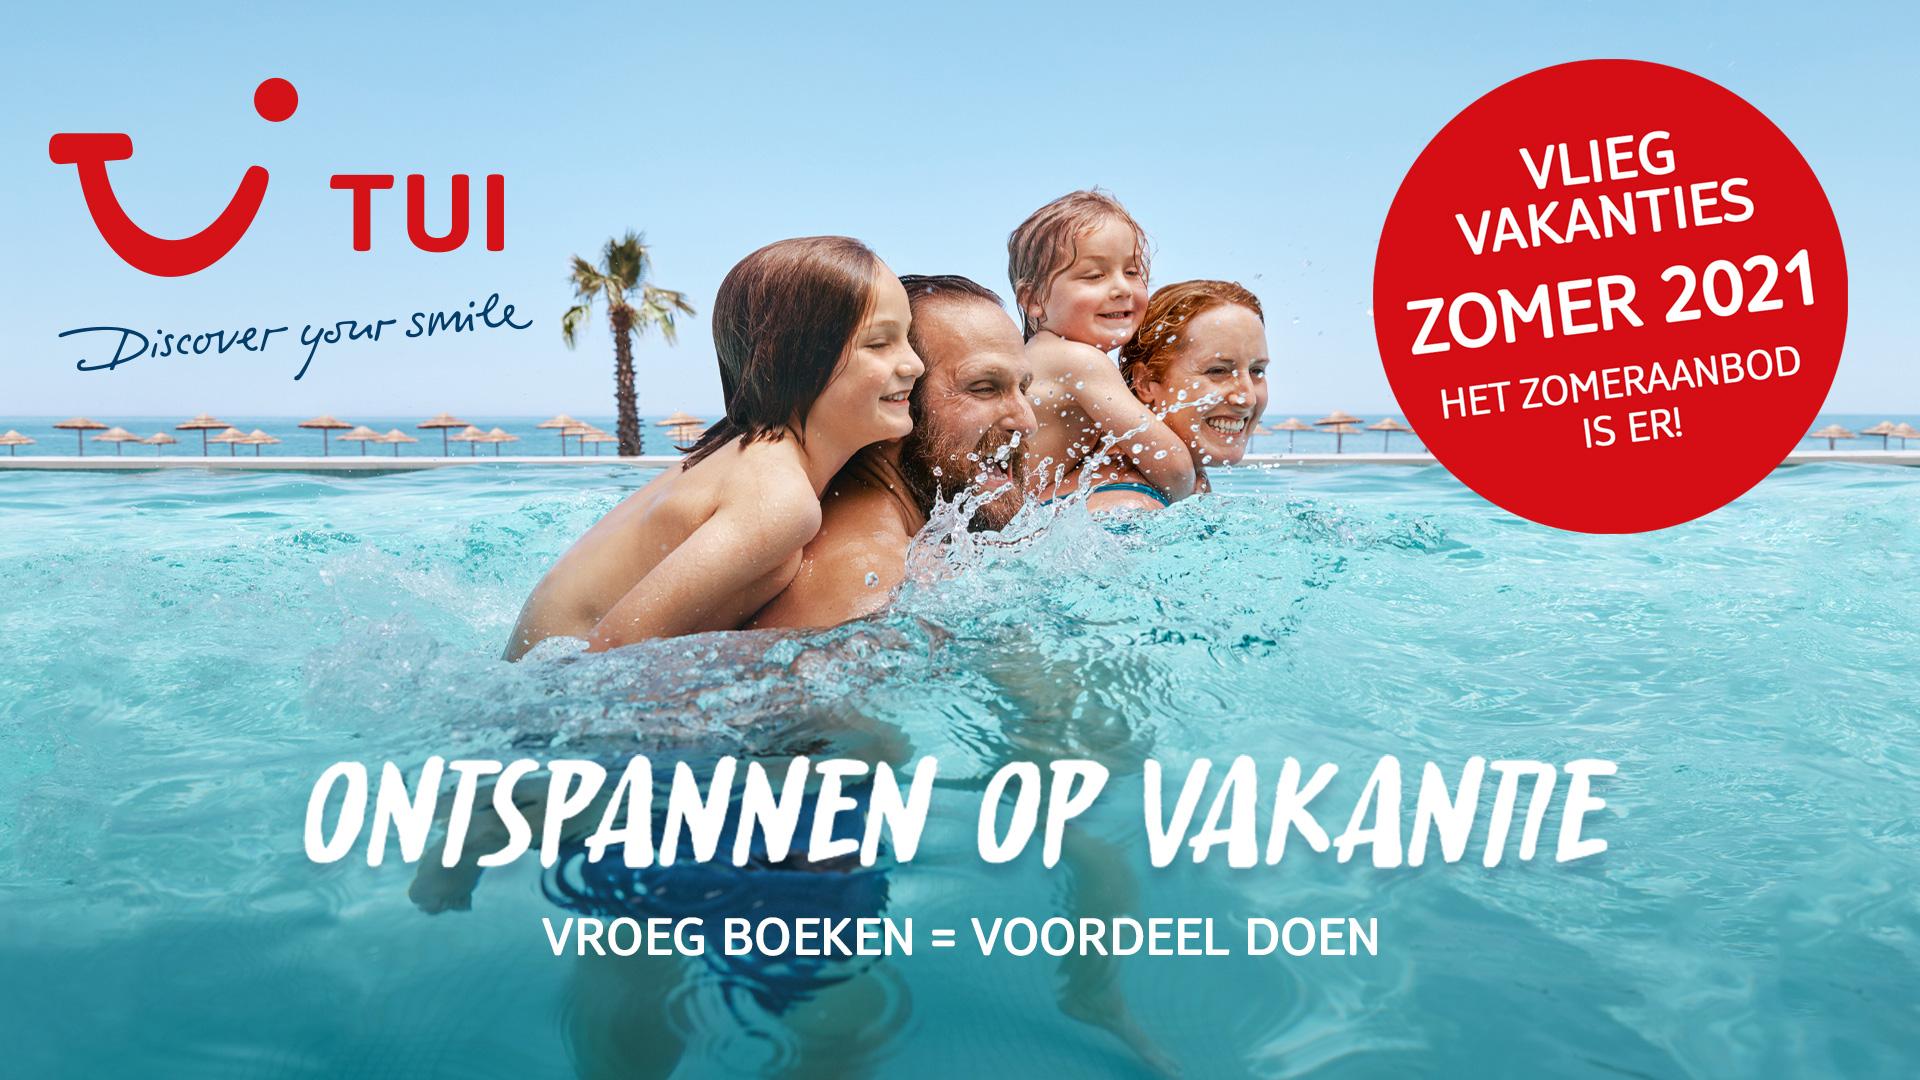 TUI_VLIEG_S21_1920x1080_NL